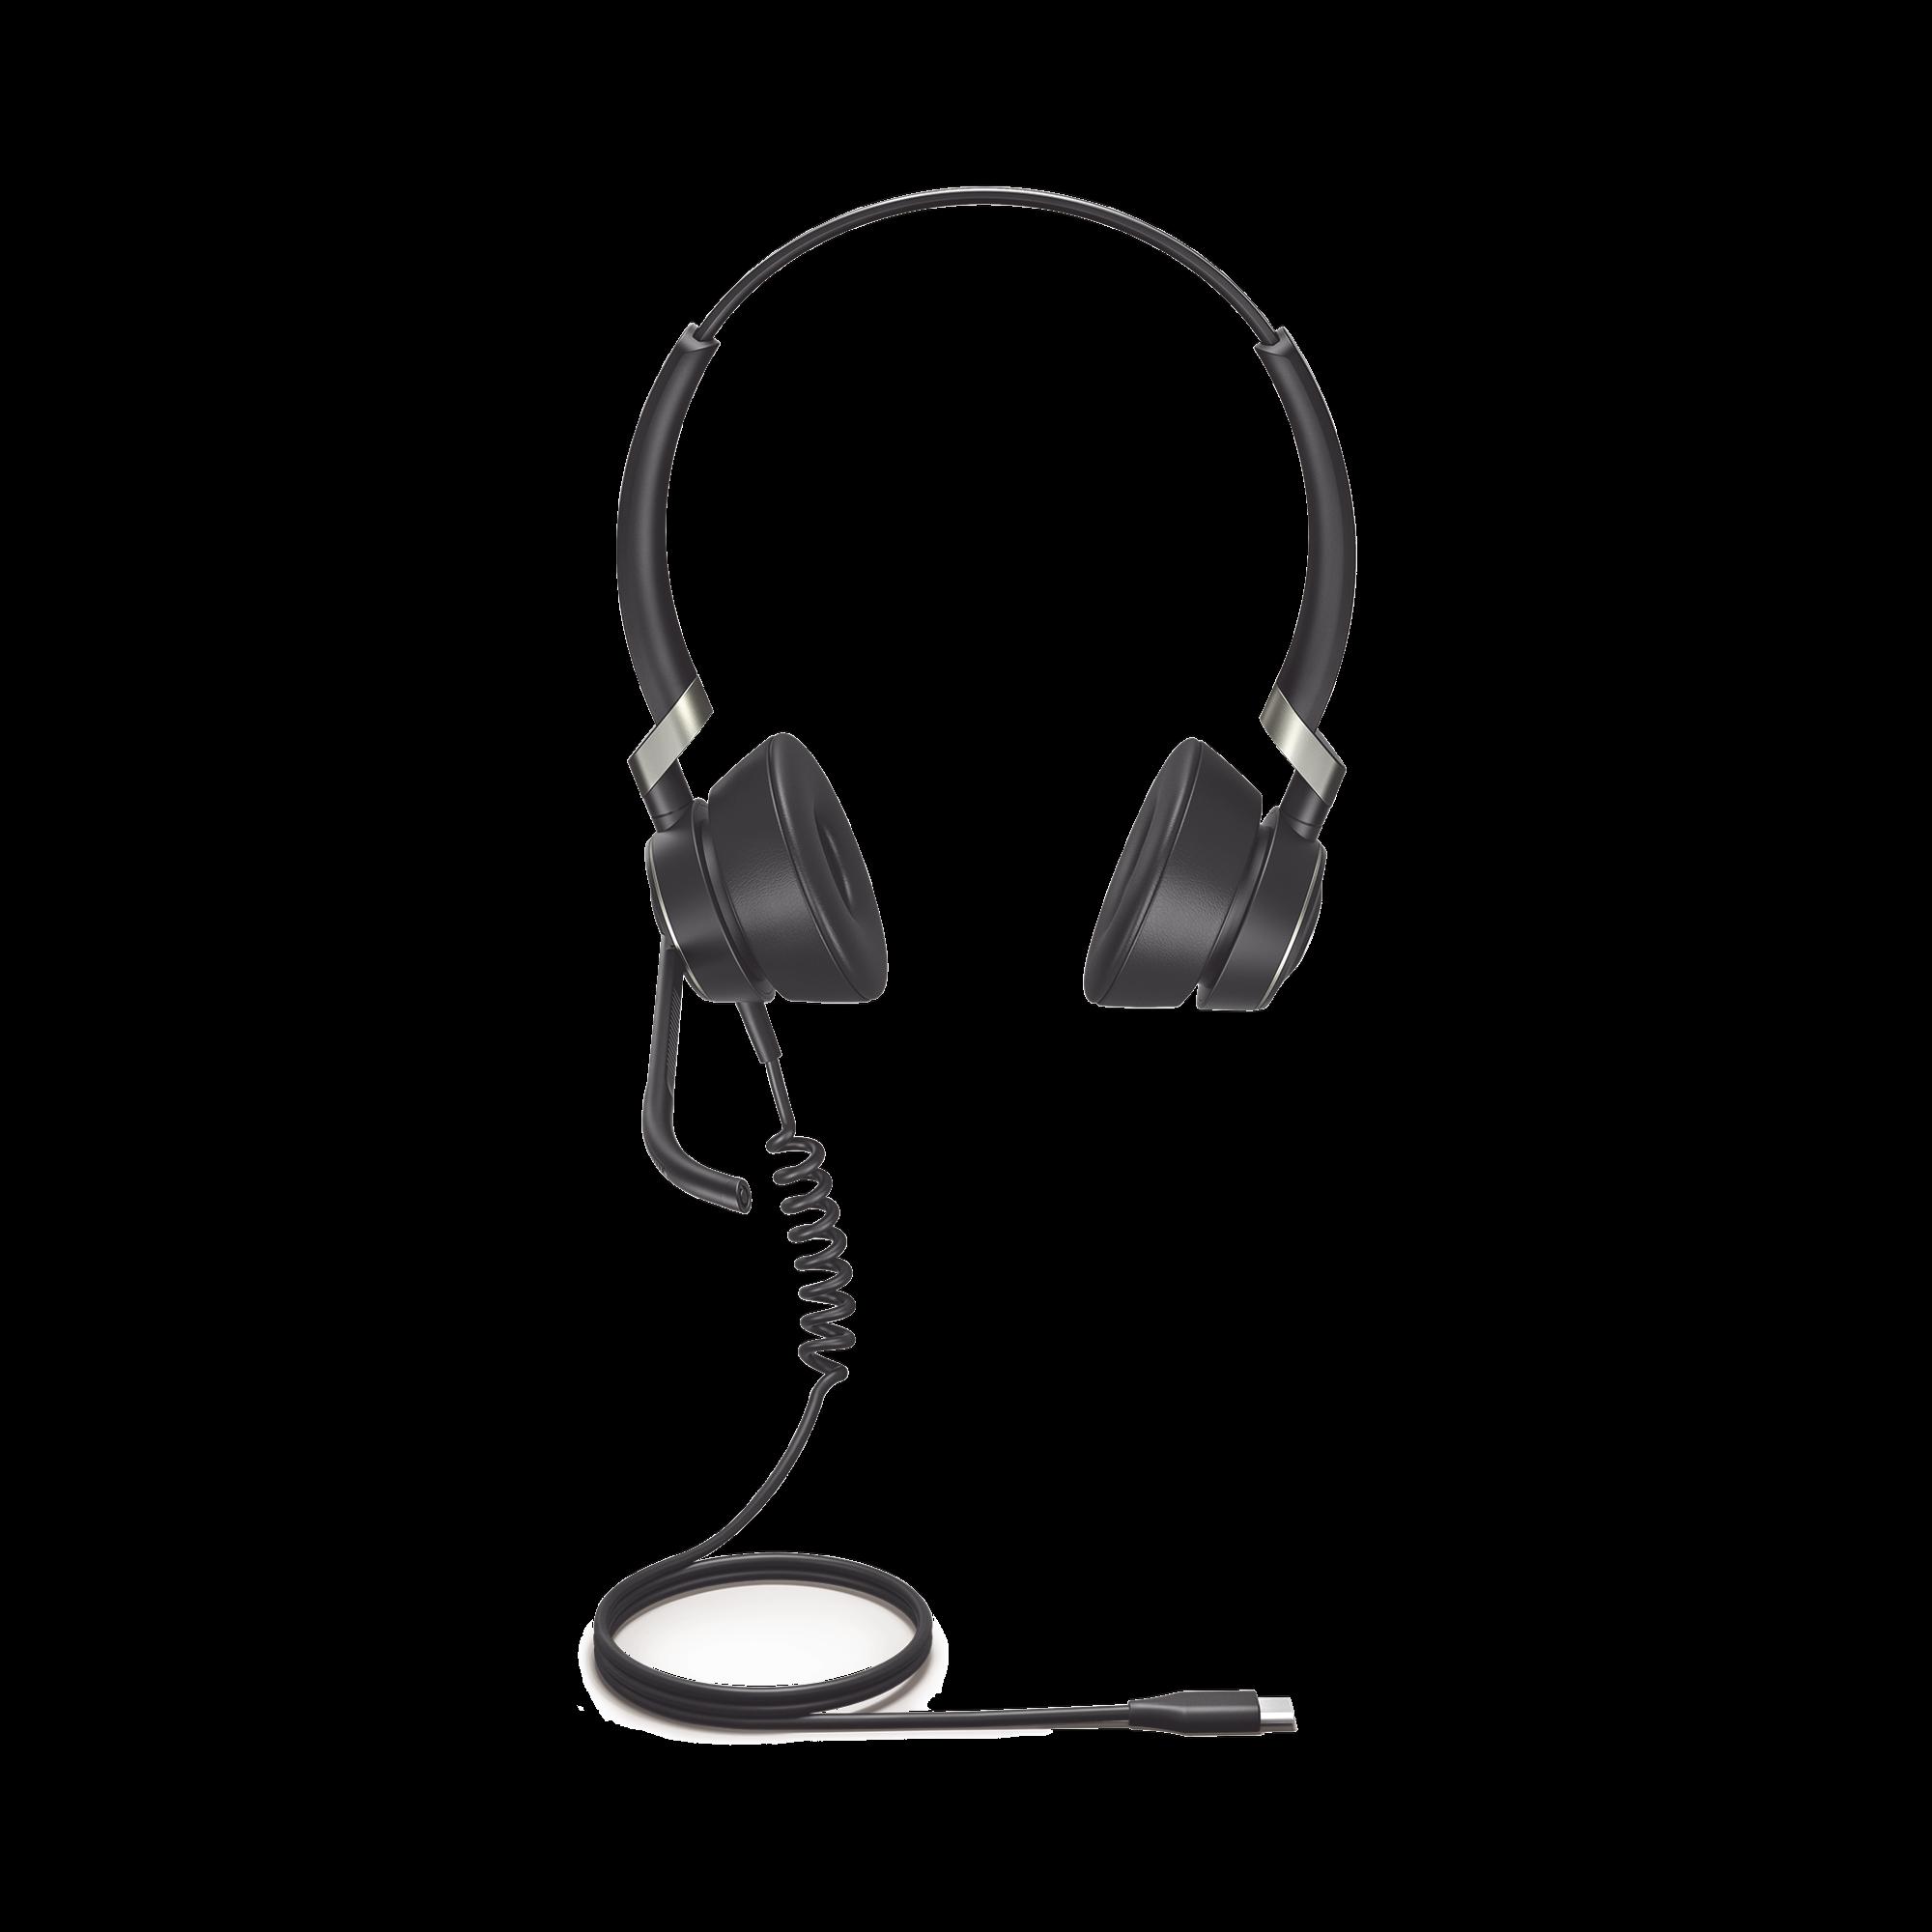 Jabra Engage 50 auricular profesional digital con conexión USB-C(5099-610-189)